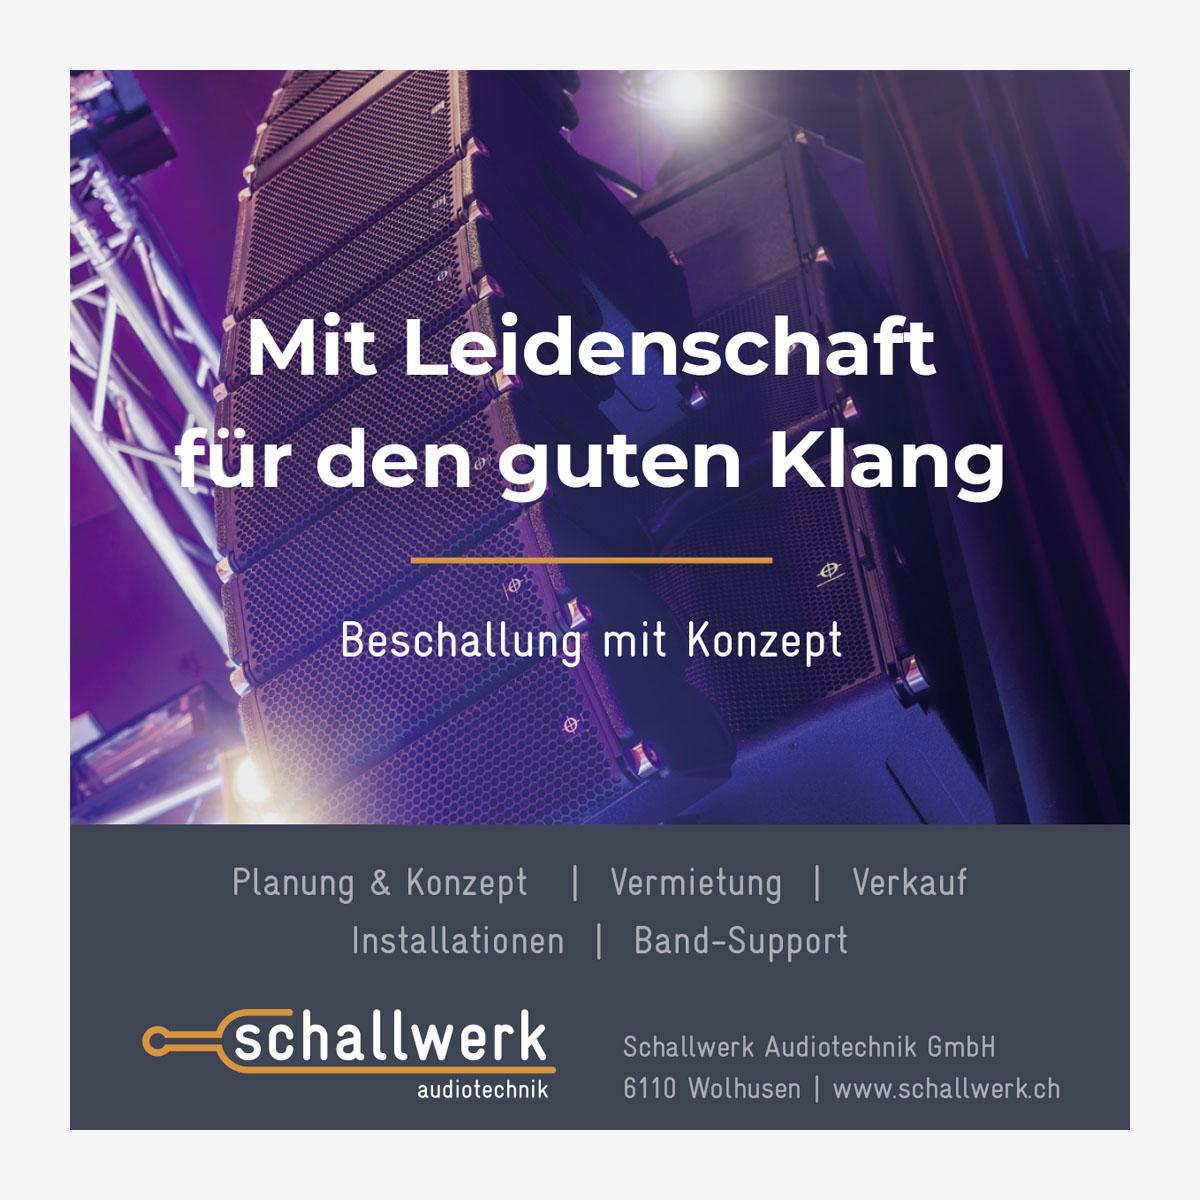 sponsoring_schallwerk.jpg